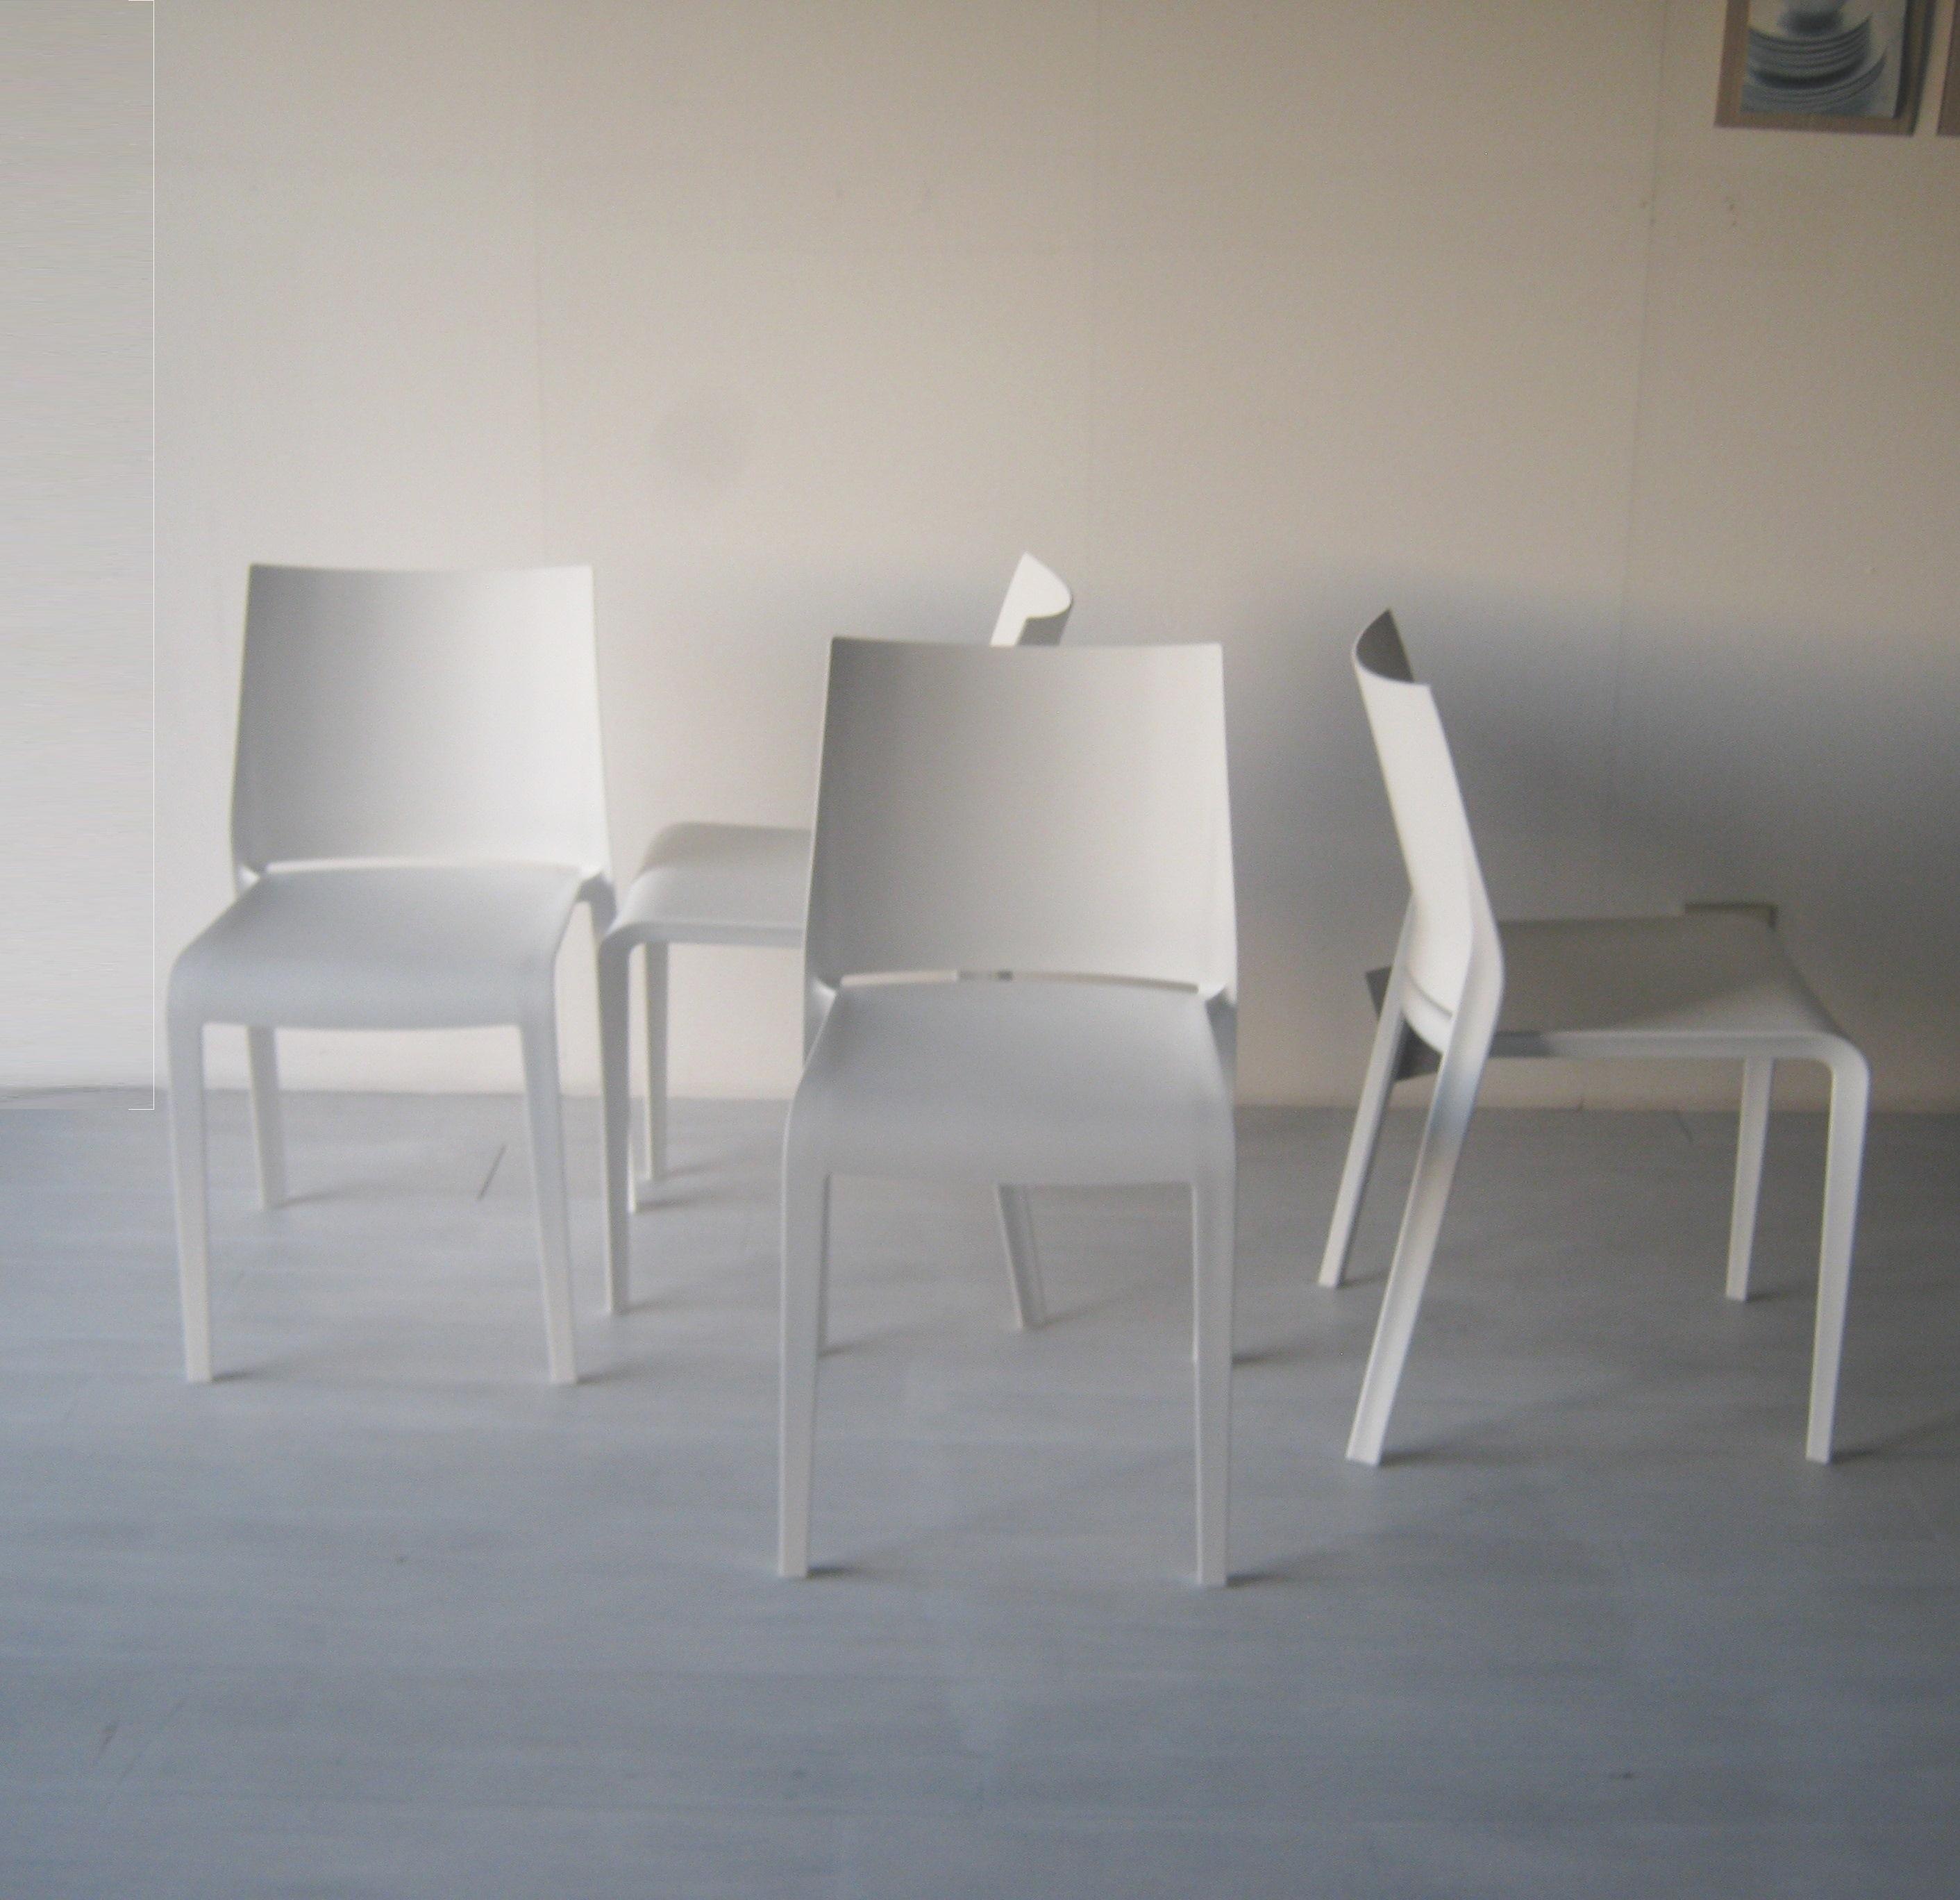 Sedia Desalto Set 4 sedie riga impilabili , desalto outlet - Sedie a prezzi scontati